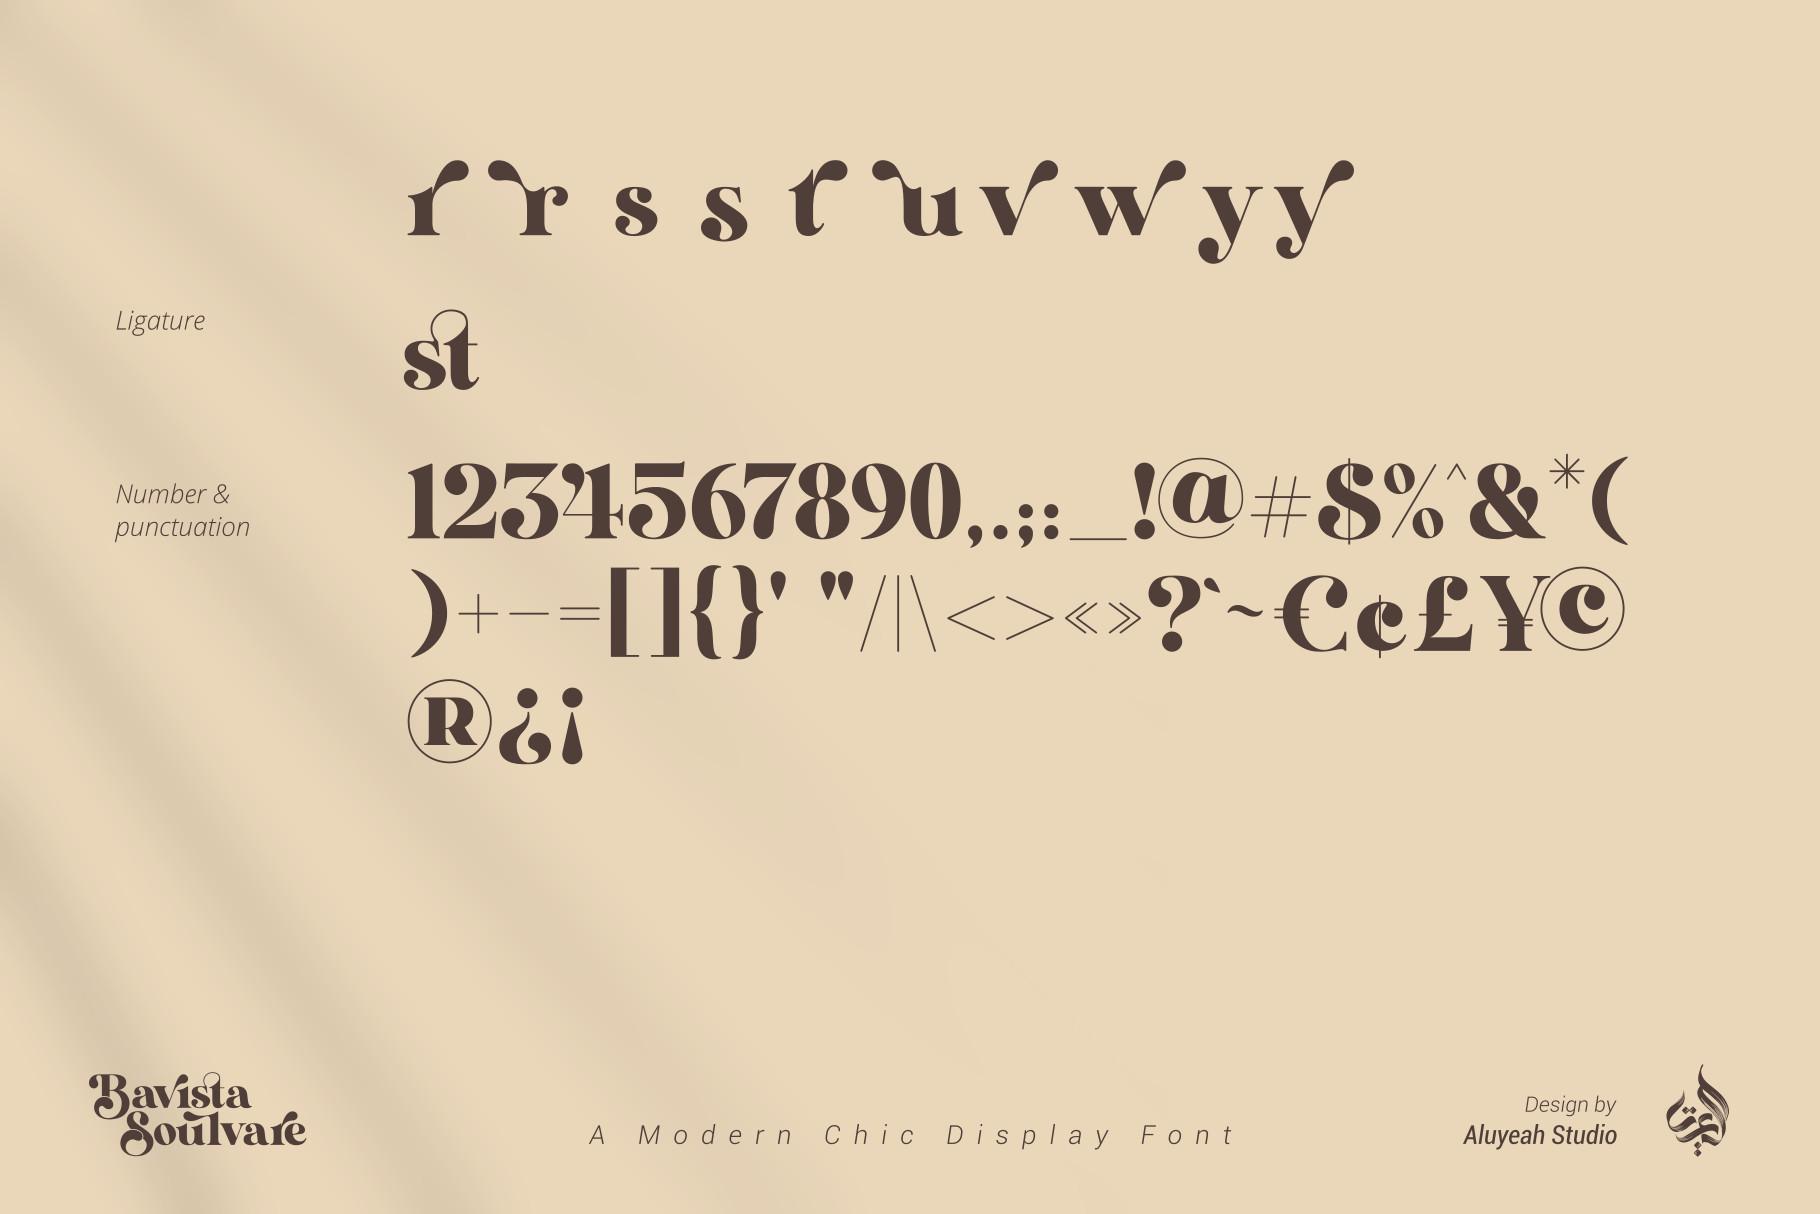 Bavista Soulvare modern display font